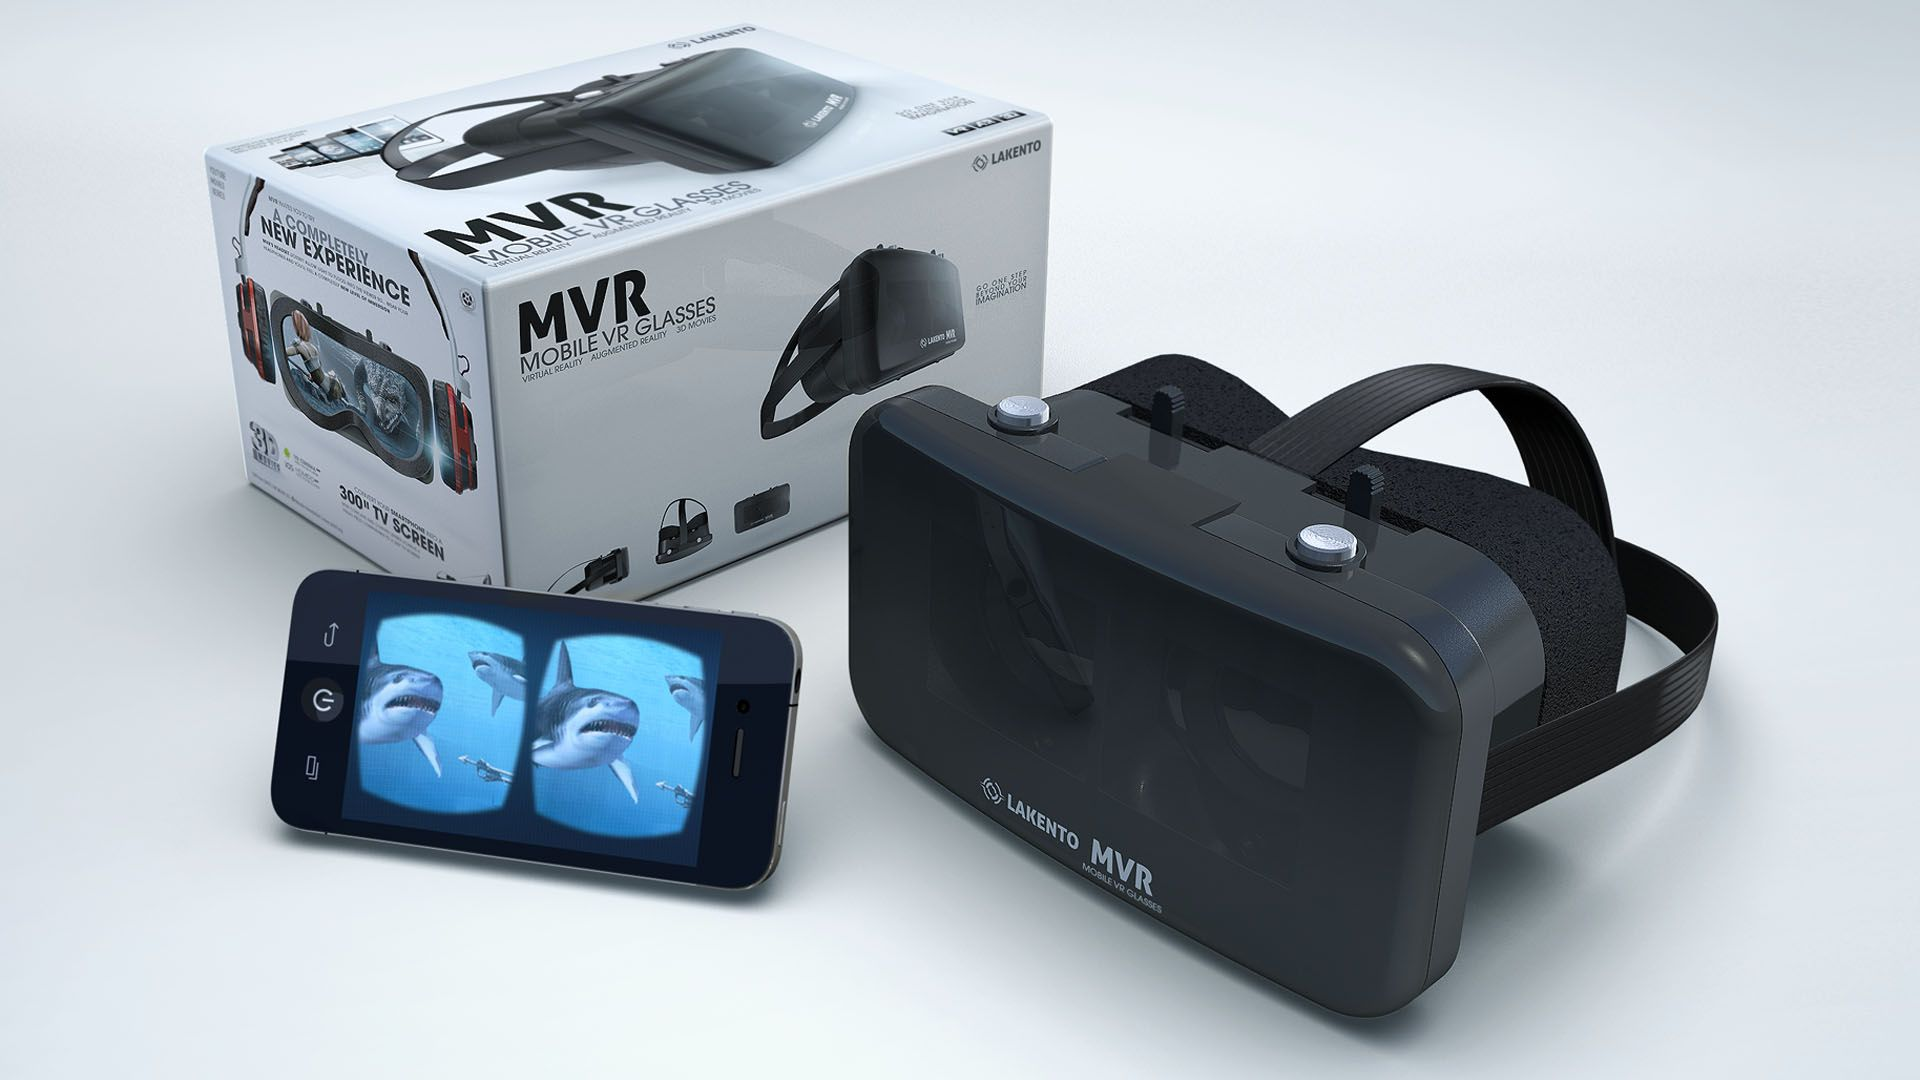 Nuevo Pack 2 de Lakento MVR